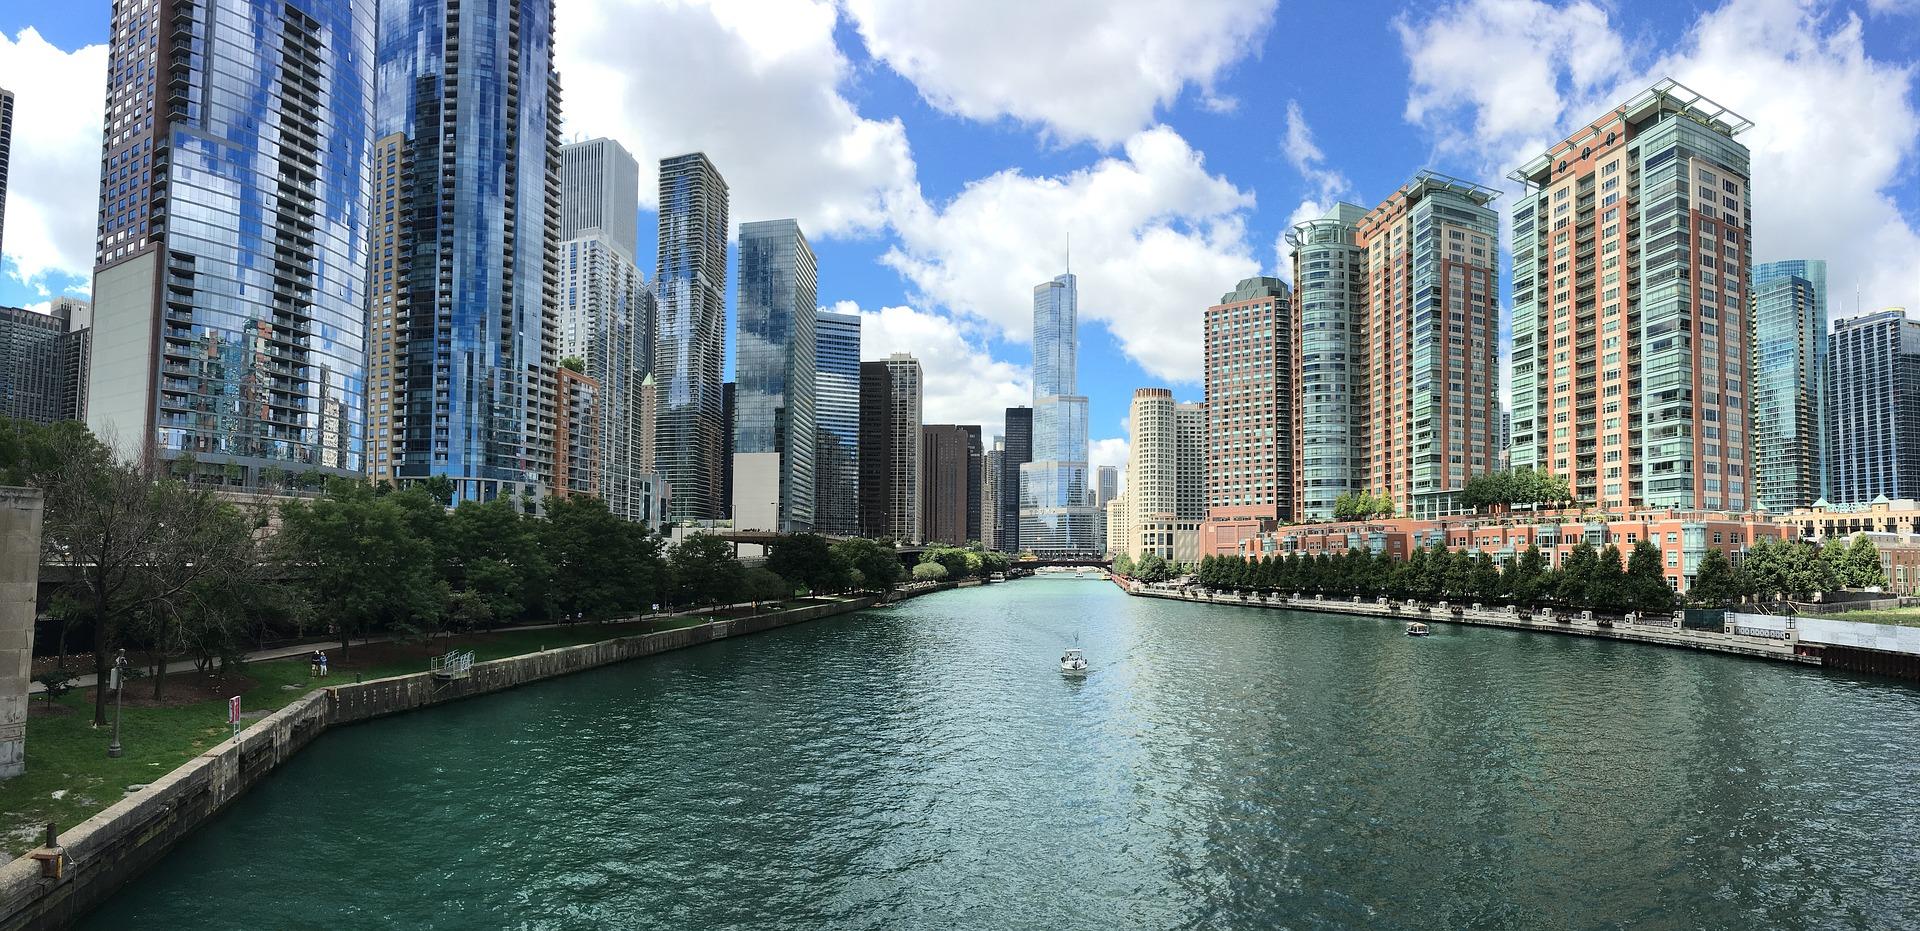 pixabay chicago